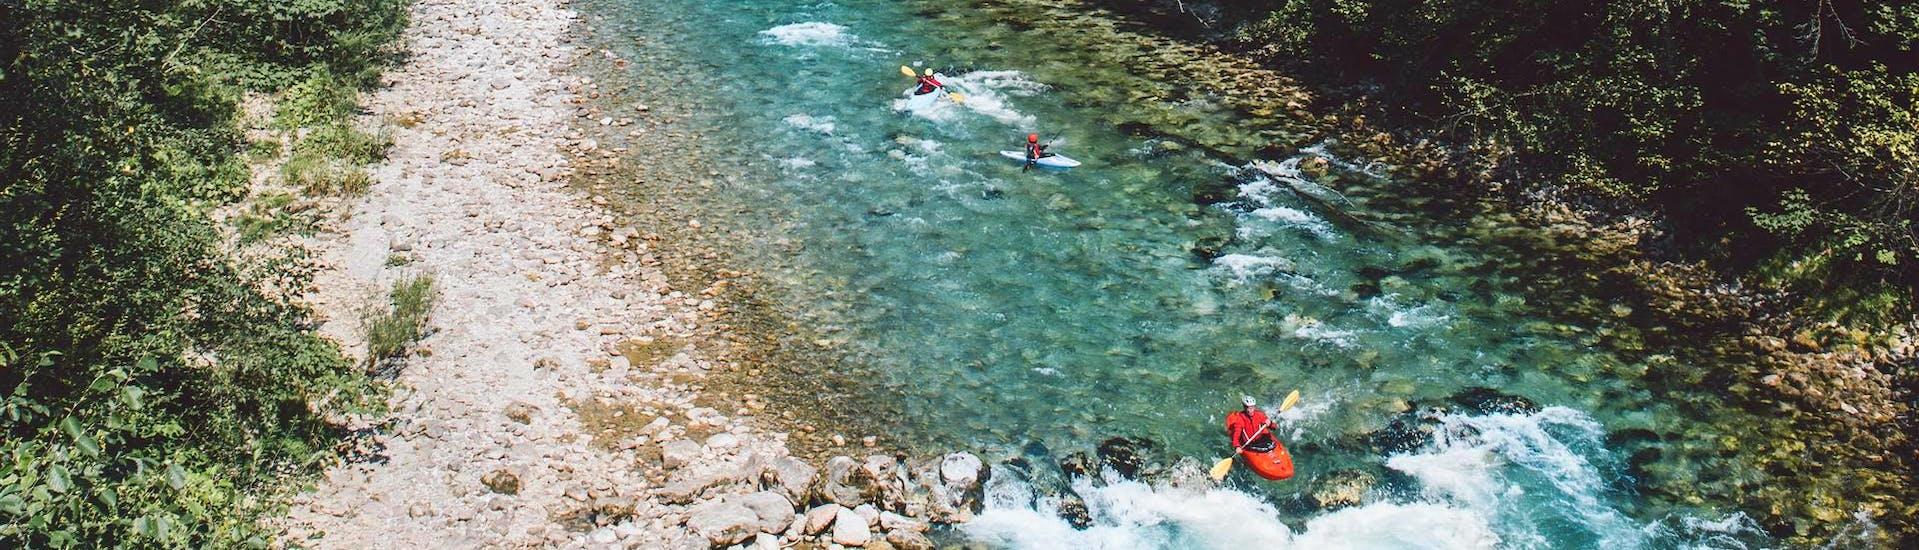 kajak-lessons-beginners-salza-adventure-outdoor-strobl-hero